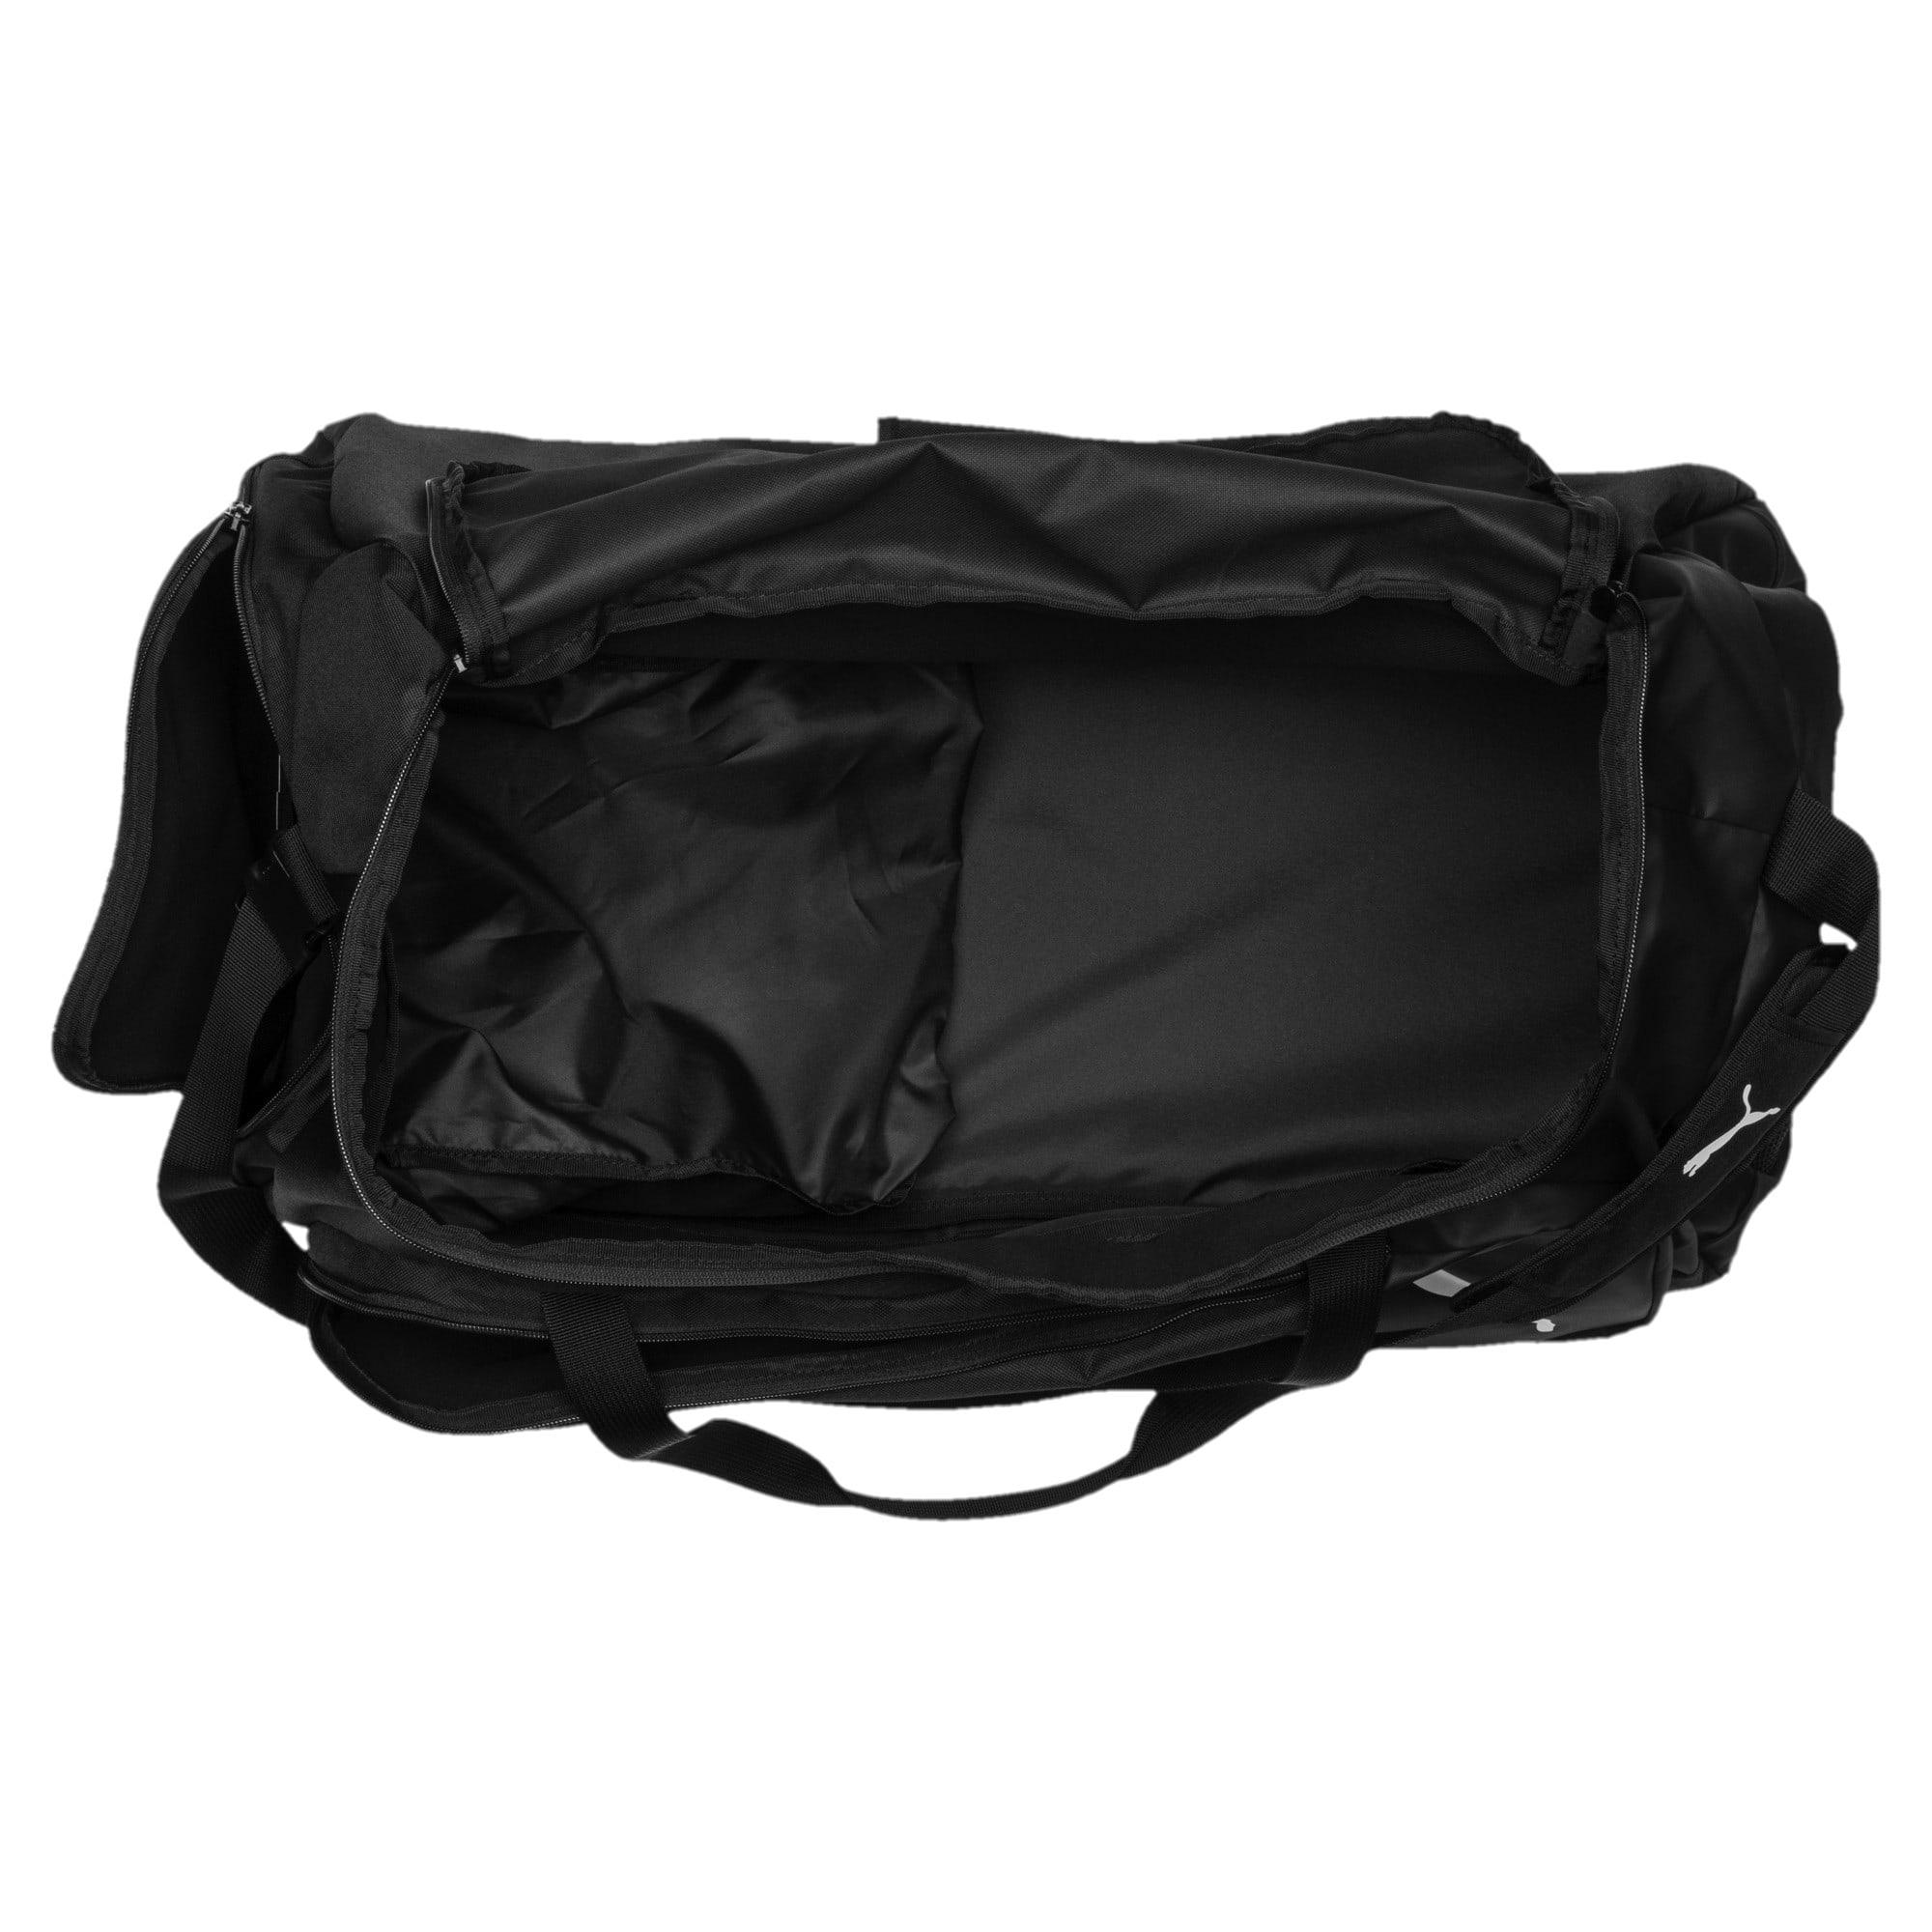 Thumbnail 3 of Liga Large Bag, Puma Black, medium